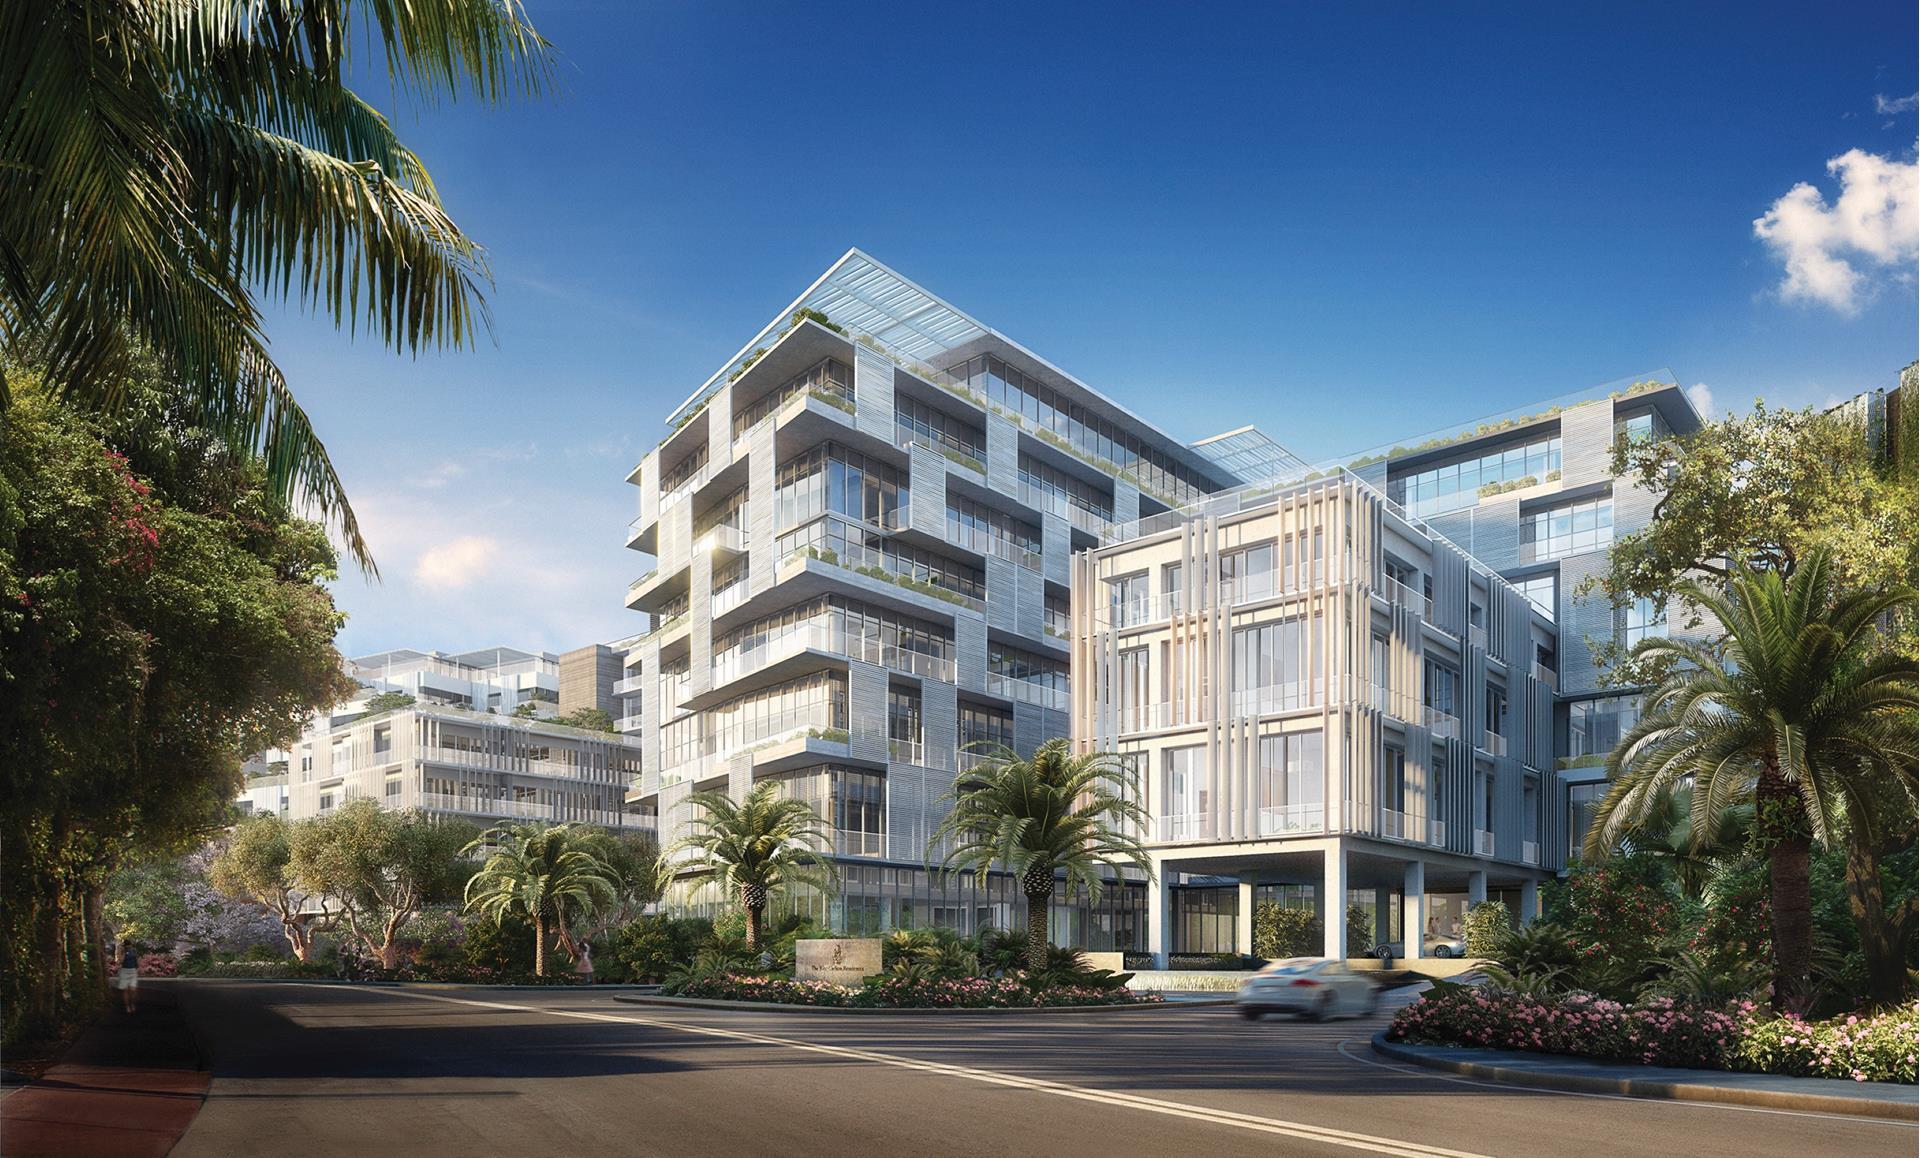 4701 Meridian Ave, Unit # 527, Miami Beach, FL